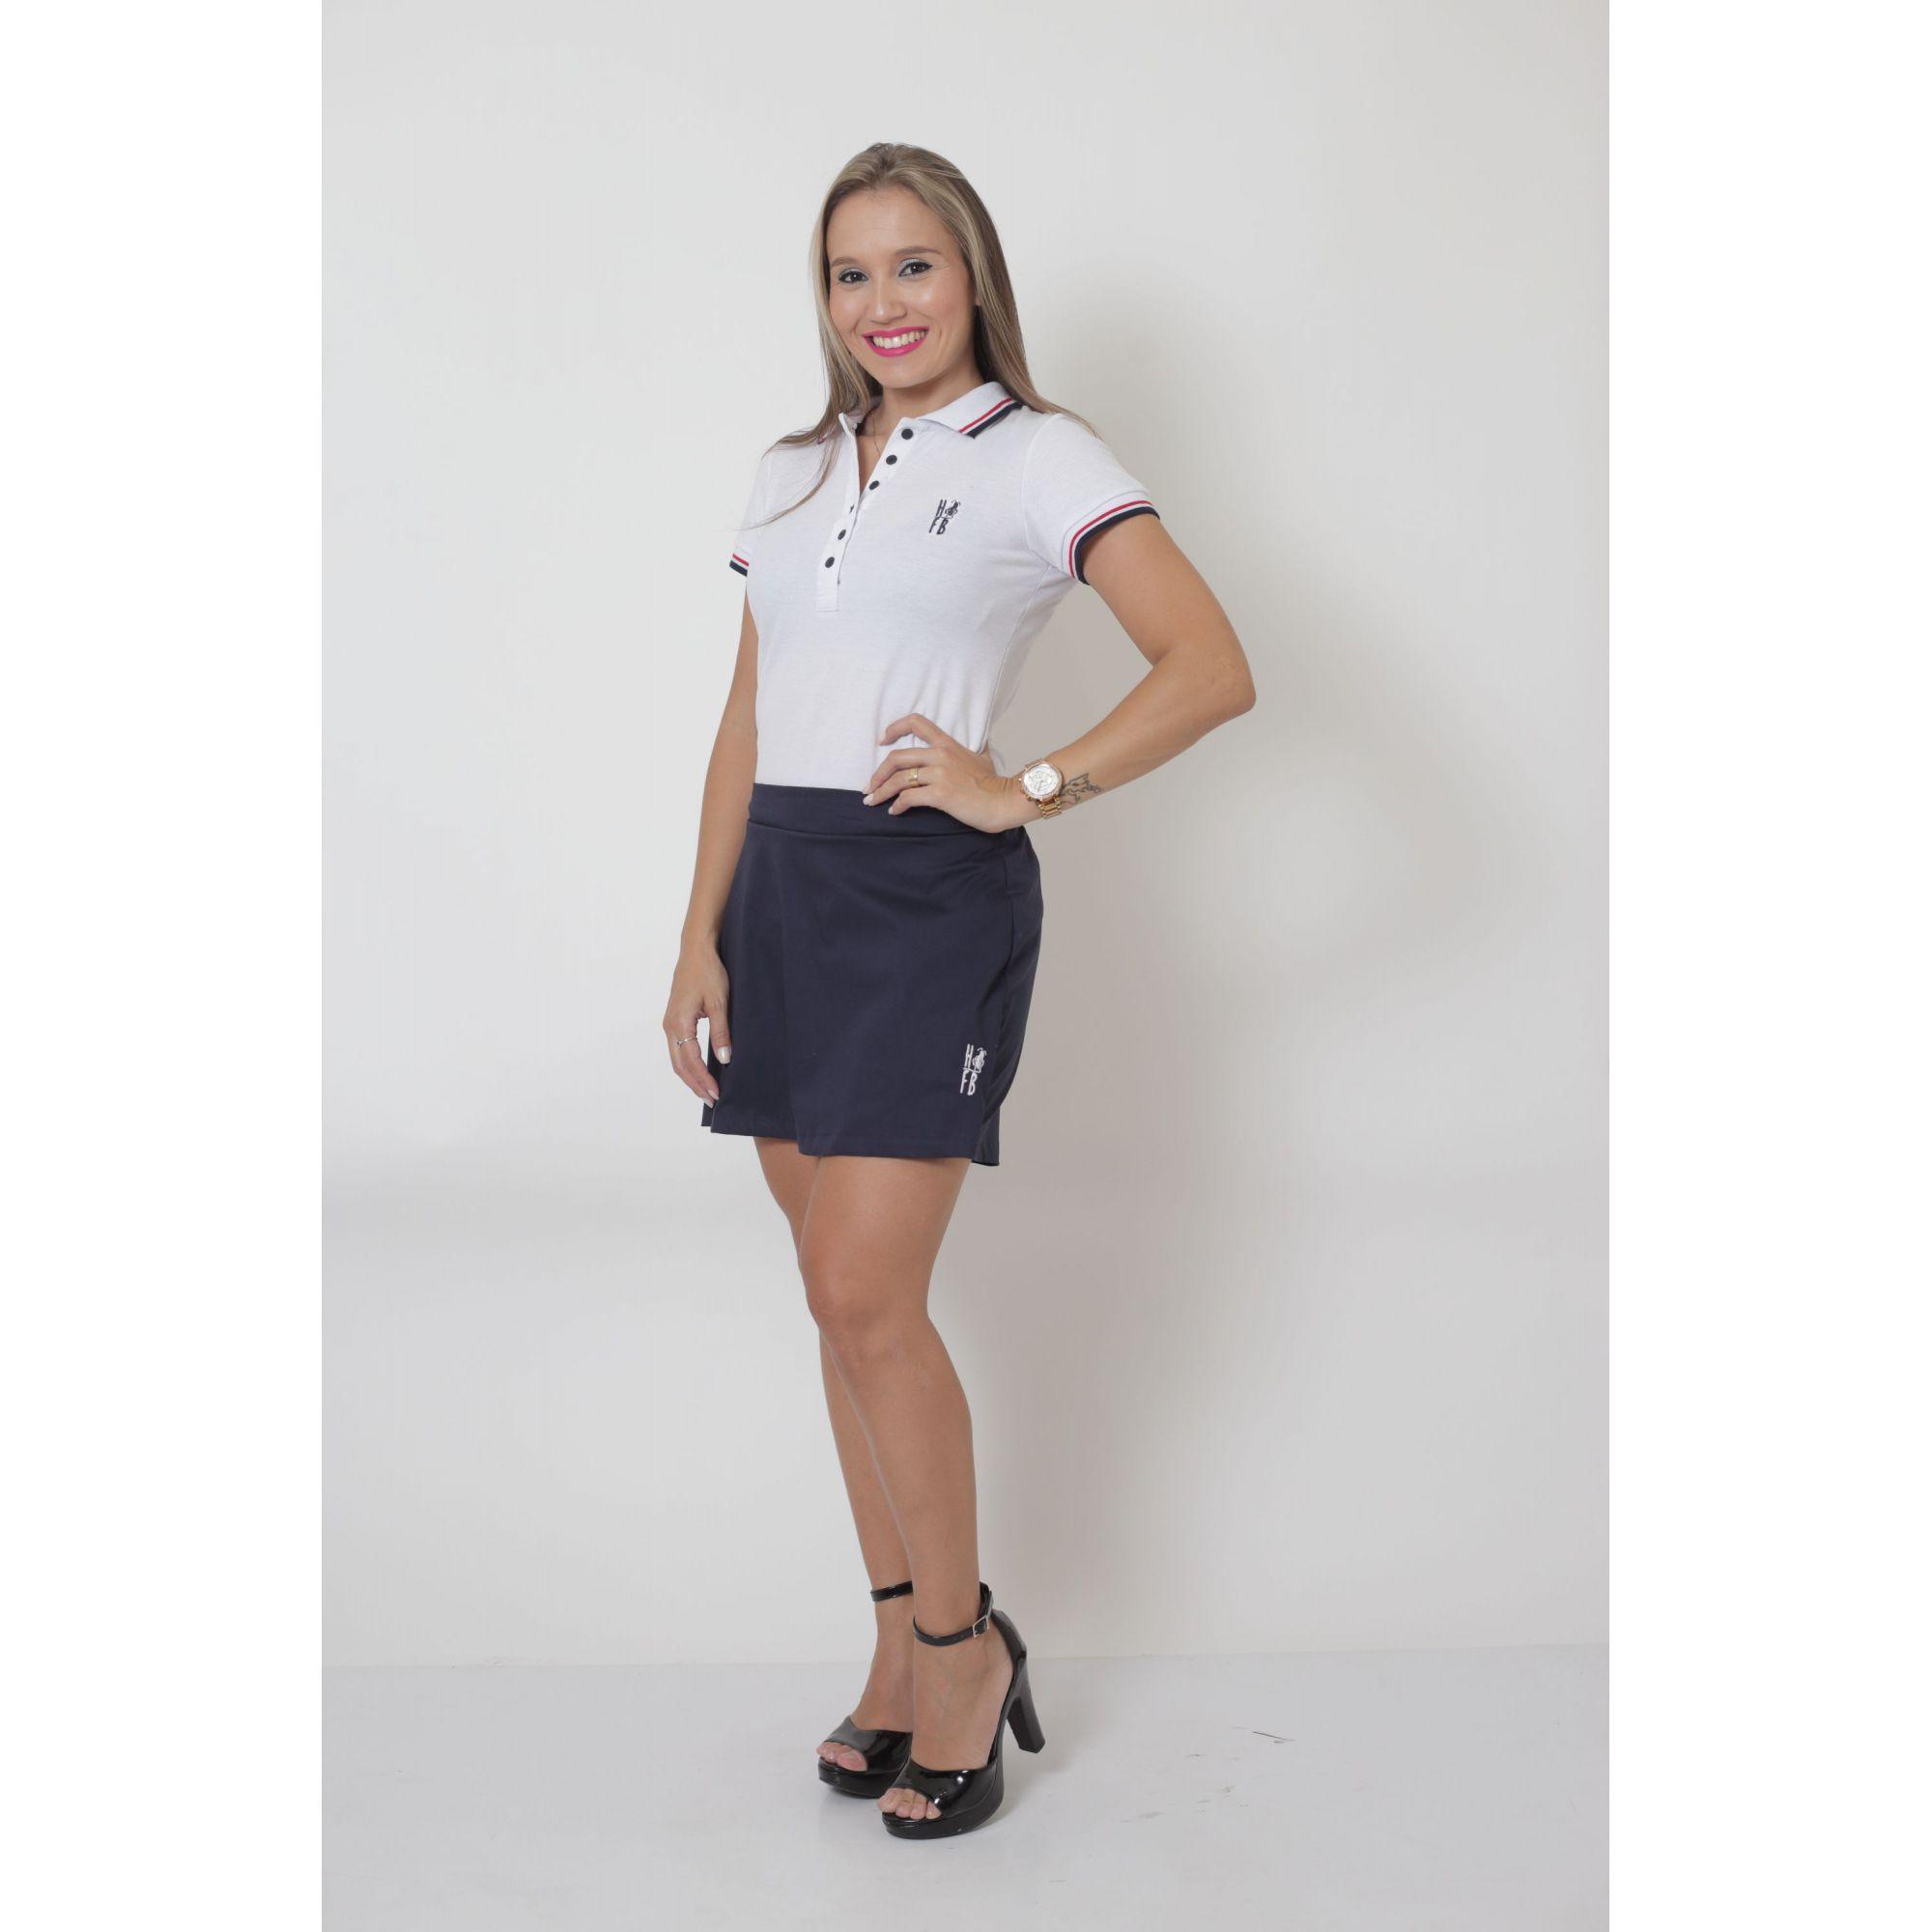 COMBO - MÃE E FILHO > Kit Shorts Saia Azul e Polo Fem Branca + Bermuda Infantil Azul e Polo Infantil Branca [Coleção Tal Mãe Tal Filho]  - Heitor Fashion Brazil